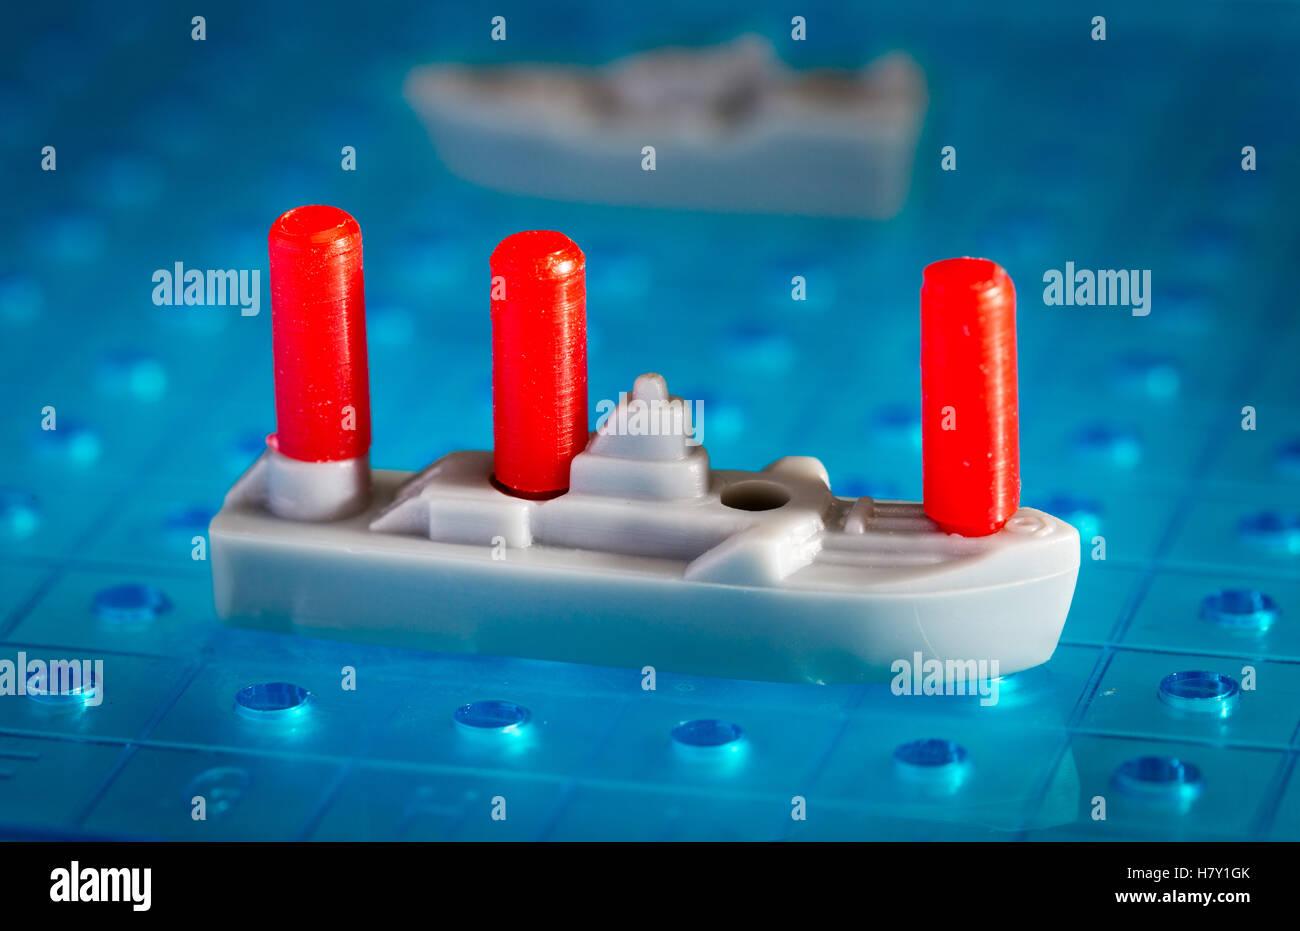 Battleships board game - Stock Image